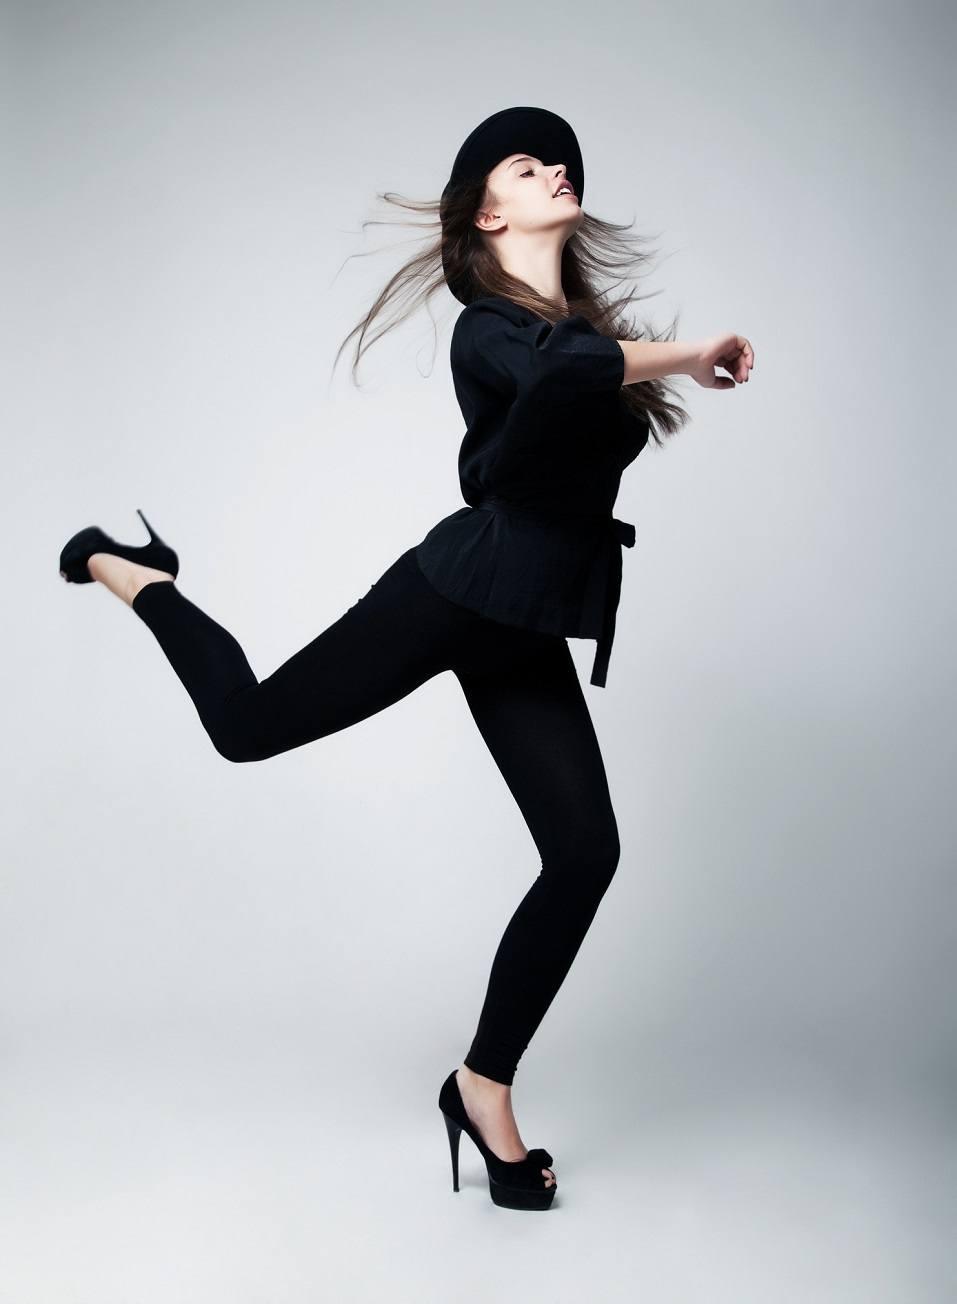 Fashion model girl in black running in studio